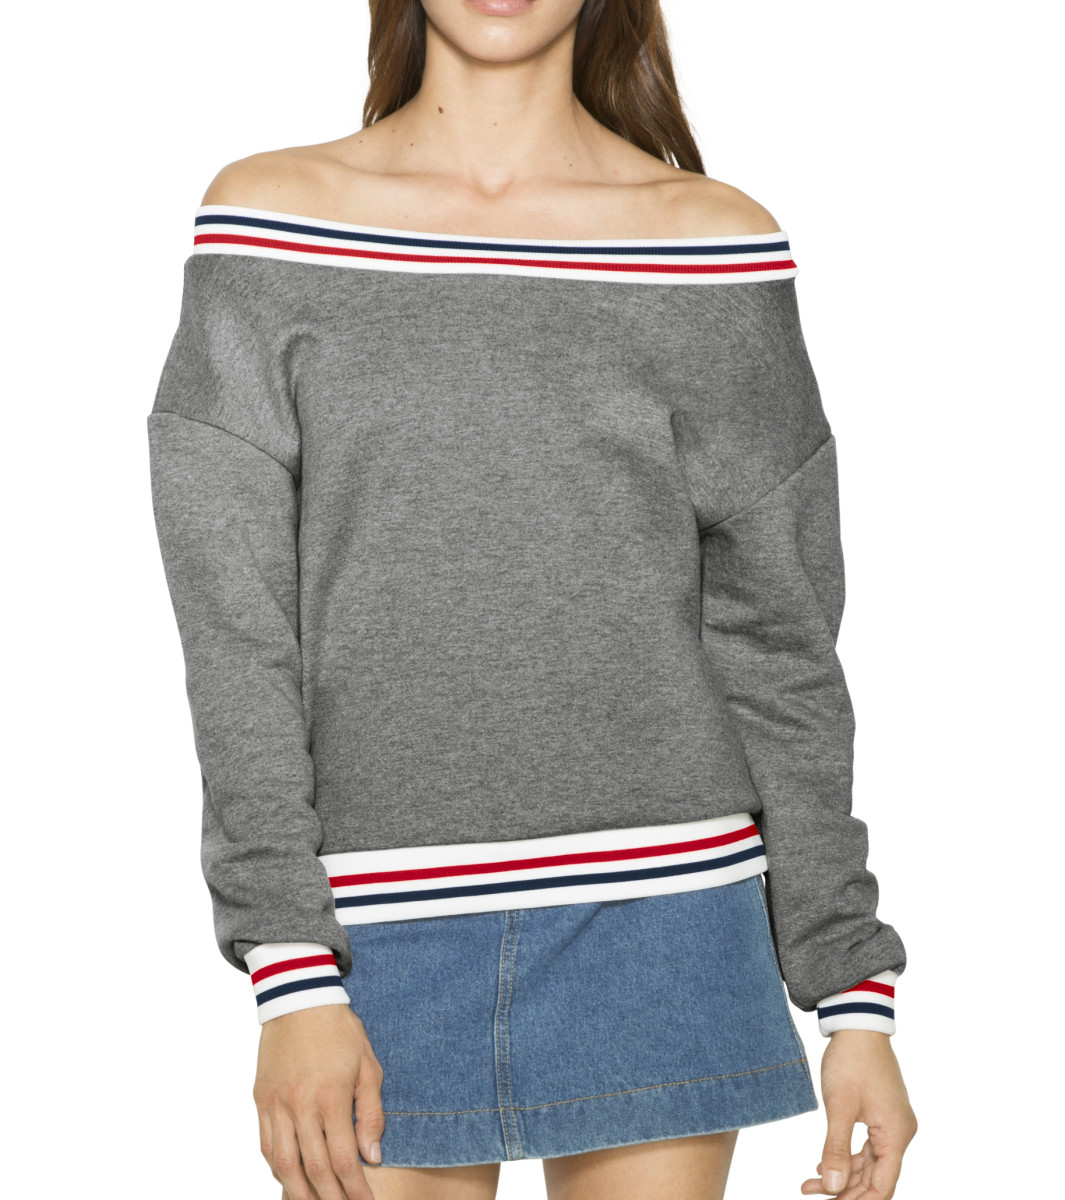 American Apparel Womens Sport Sweatshirt